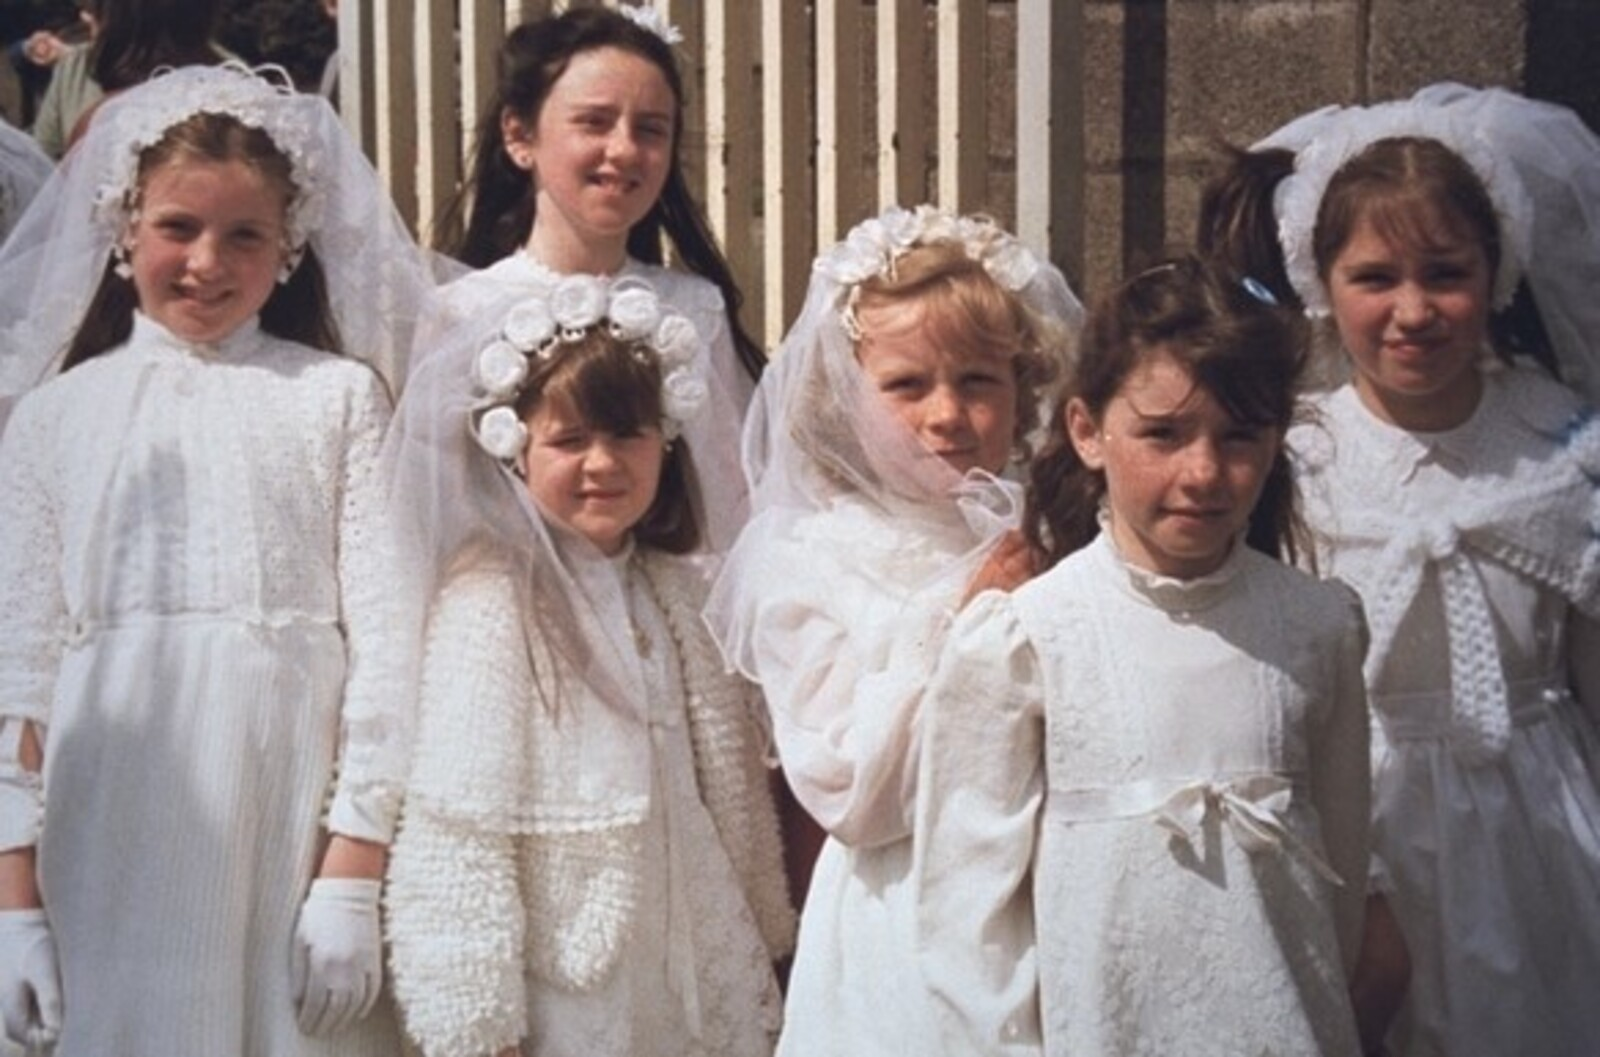 First Communion, Irish Girls, Early 1980s